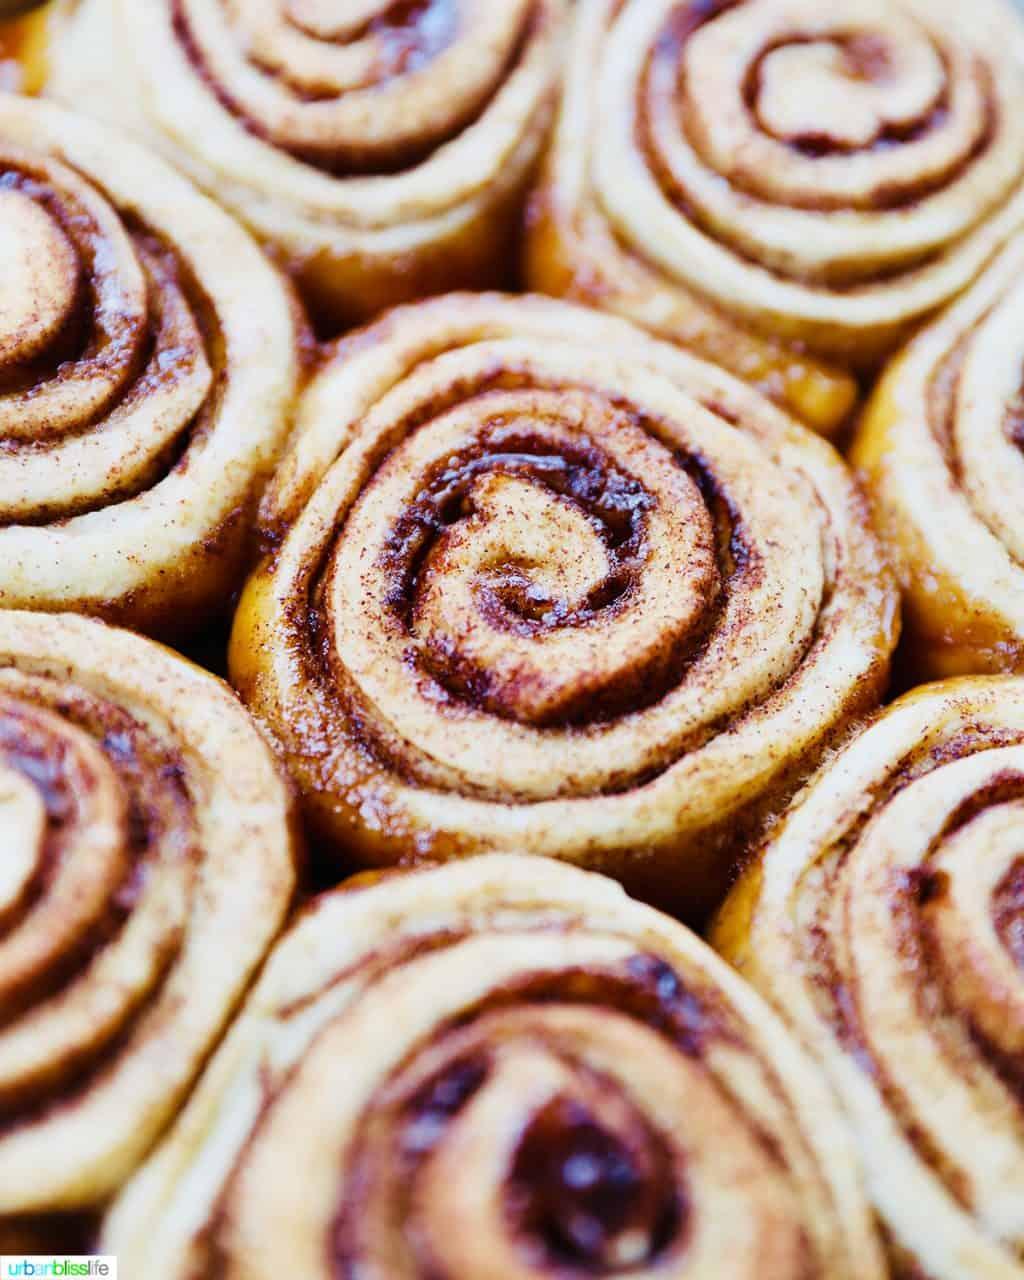 closeup of freshly baked orange cinnamon rolls without icing